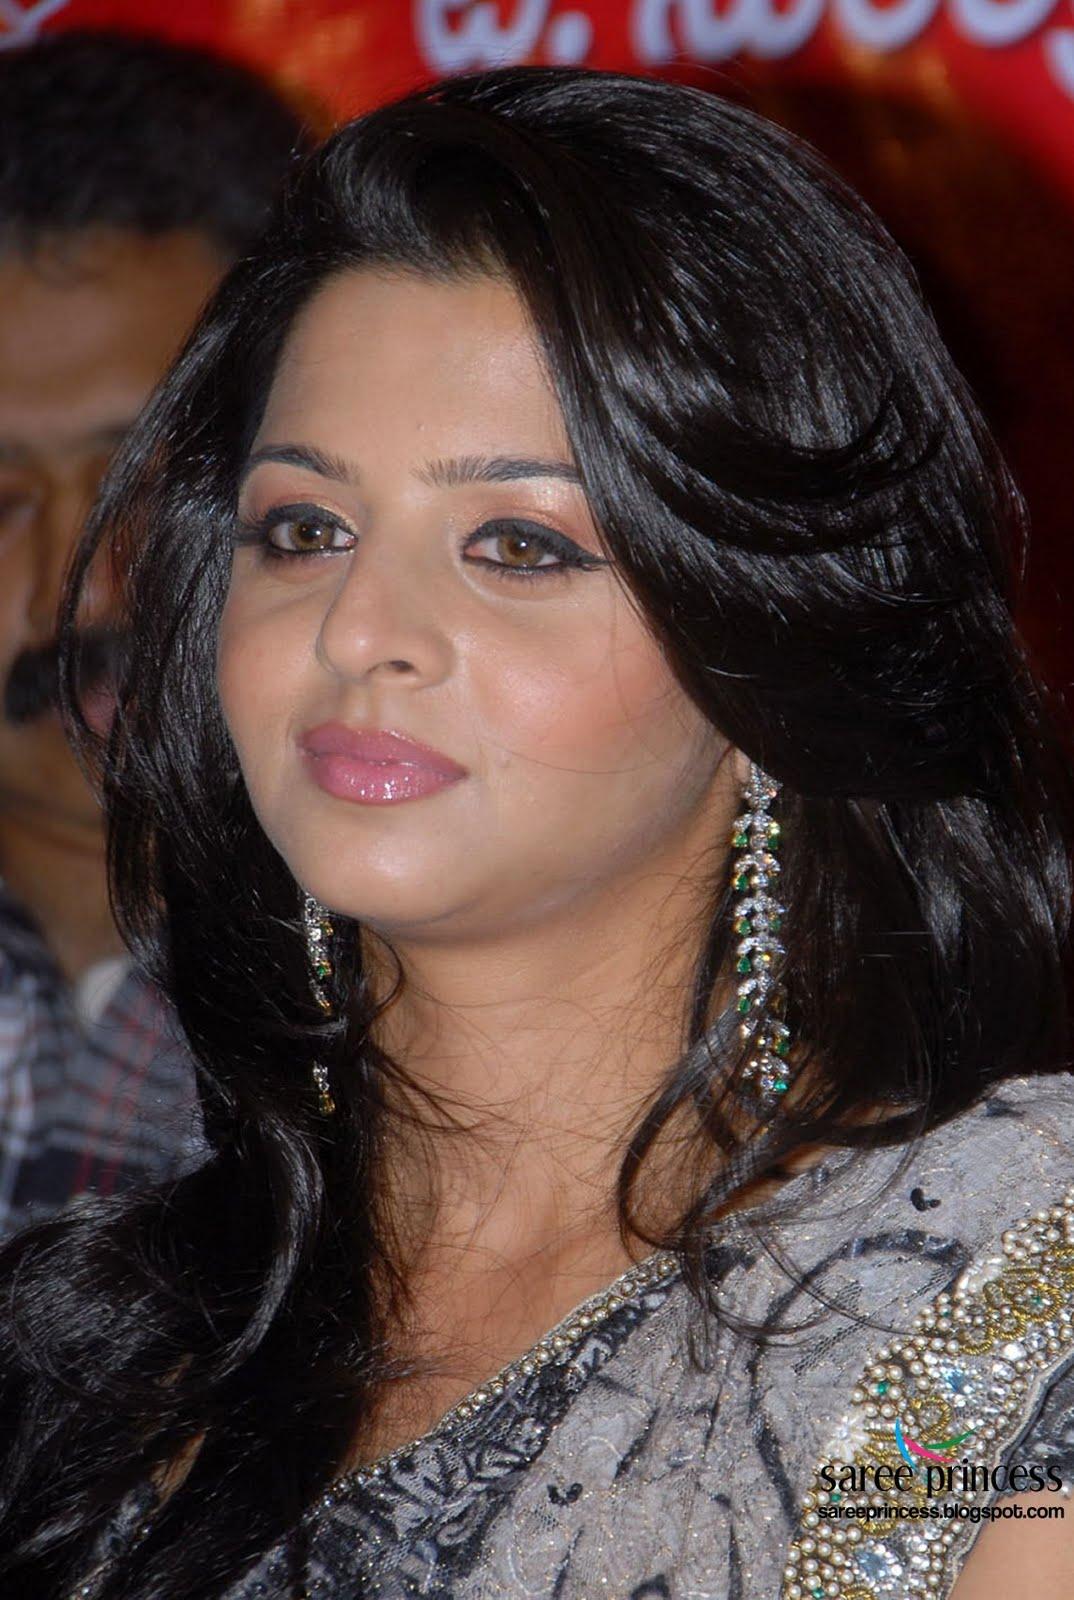 Zarine Khan Cute Wallpaper Vedhika Kumar Indian Cute Actress Photoshoot In Black